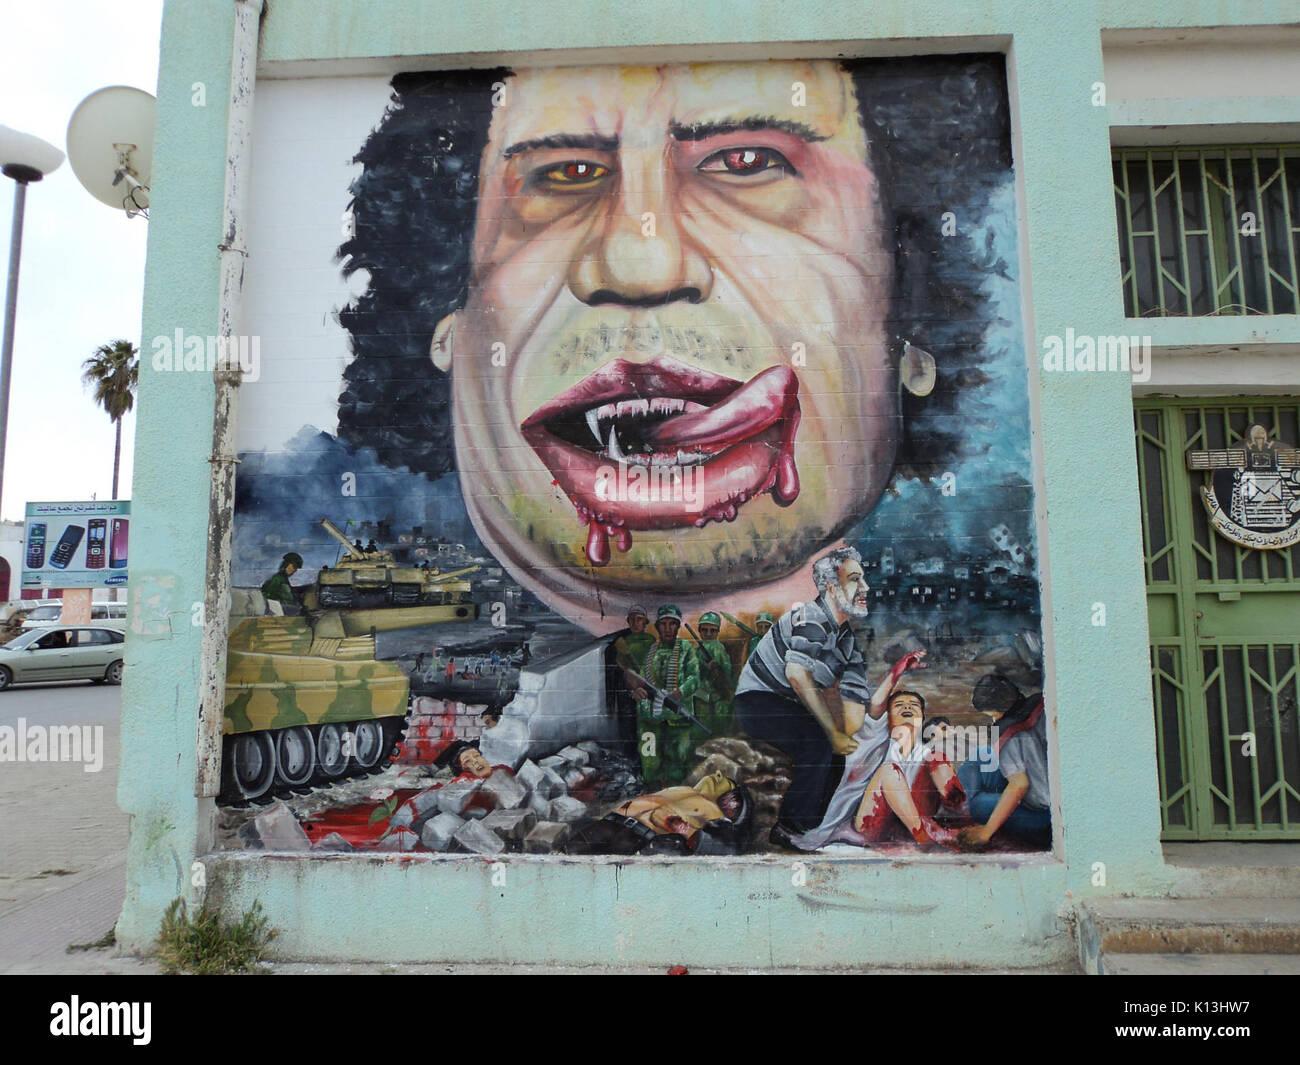 Al Bayda caricatures of Gadafi - Stock Image